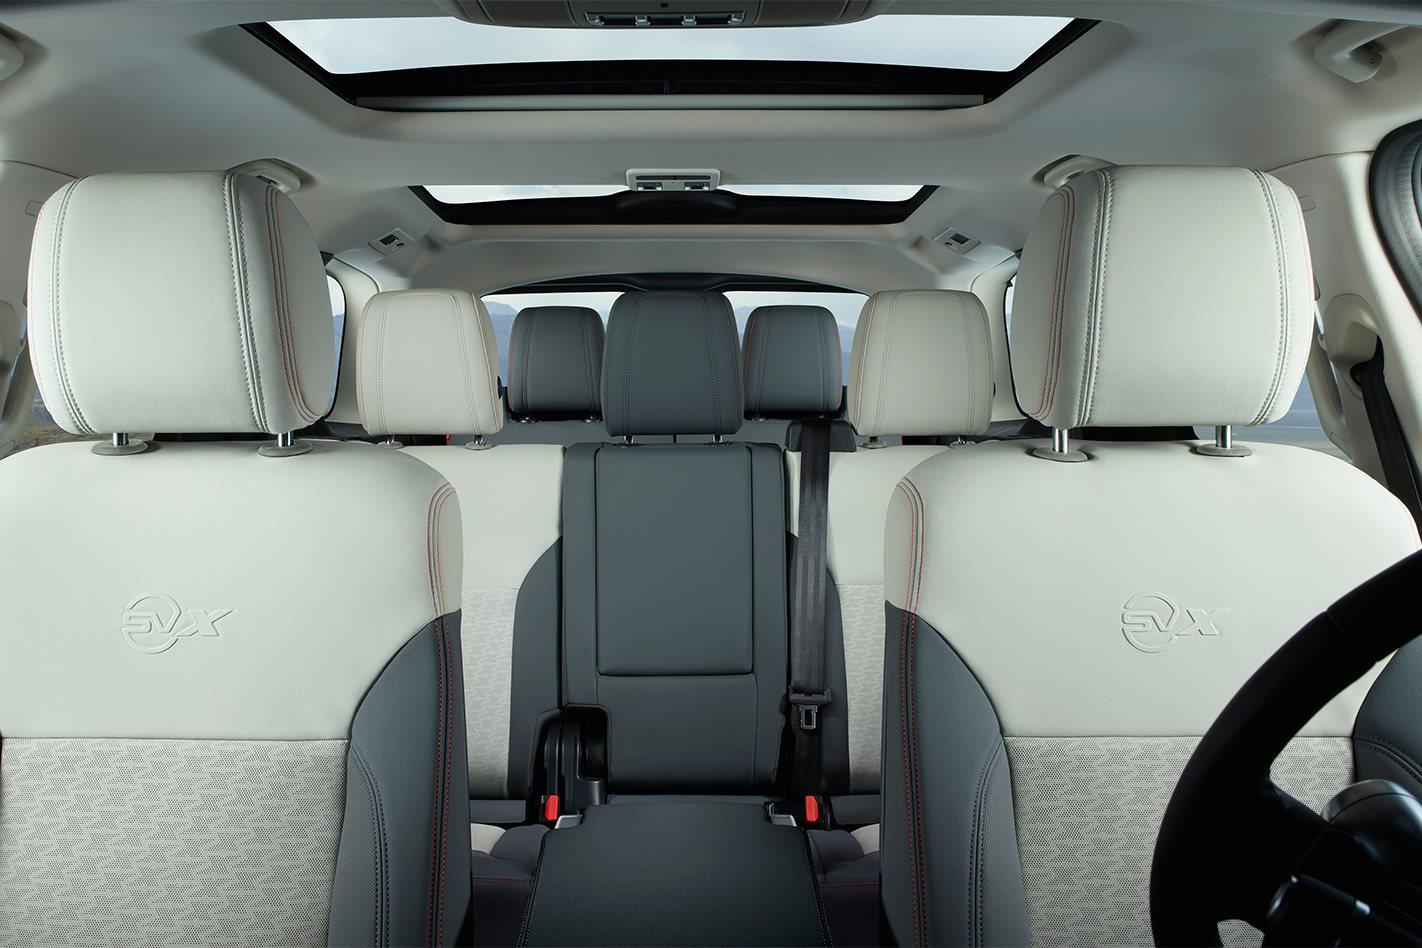 Frankfurt Motor Show: Land Rover Discovery SVX Revealed